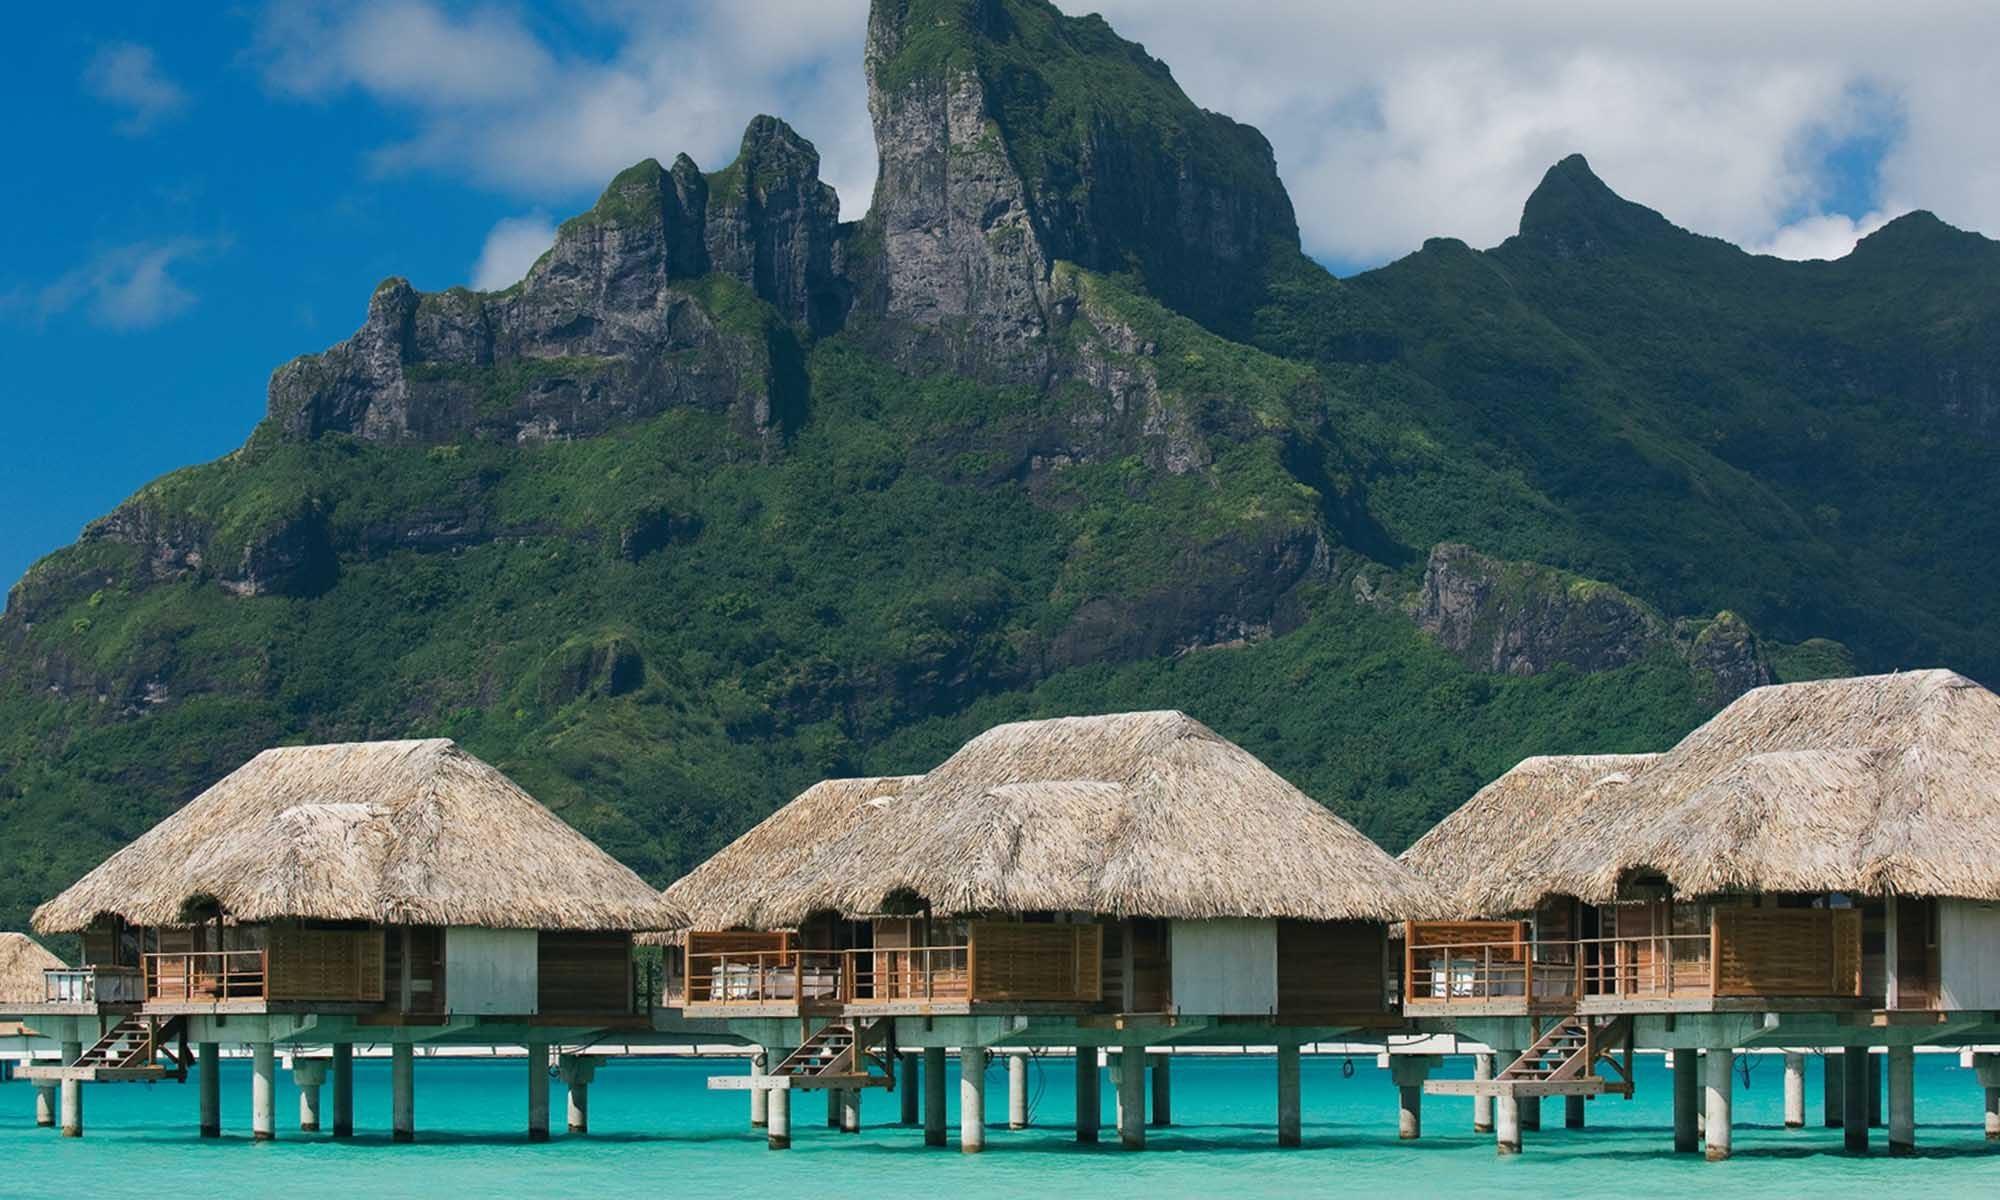 Four Seasons Resort Bora Bora Overwater Bungalows